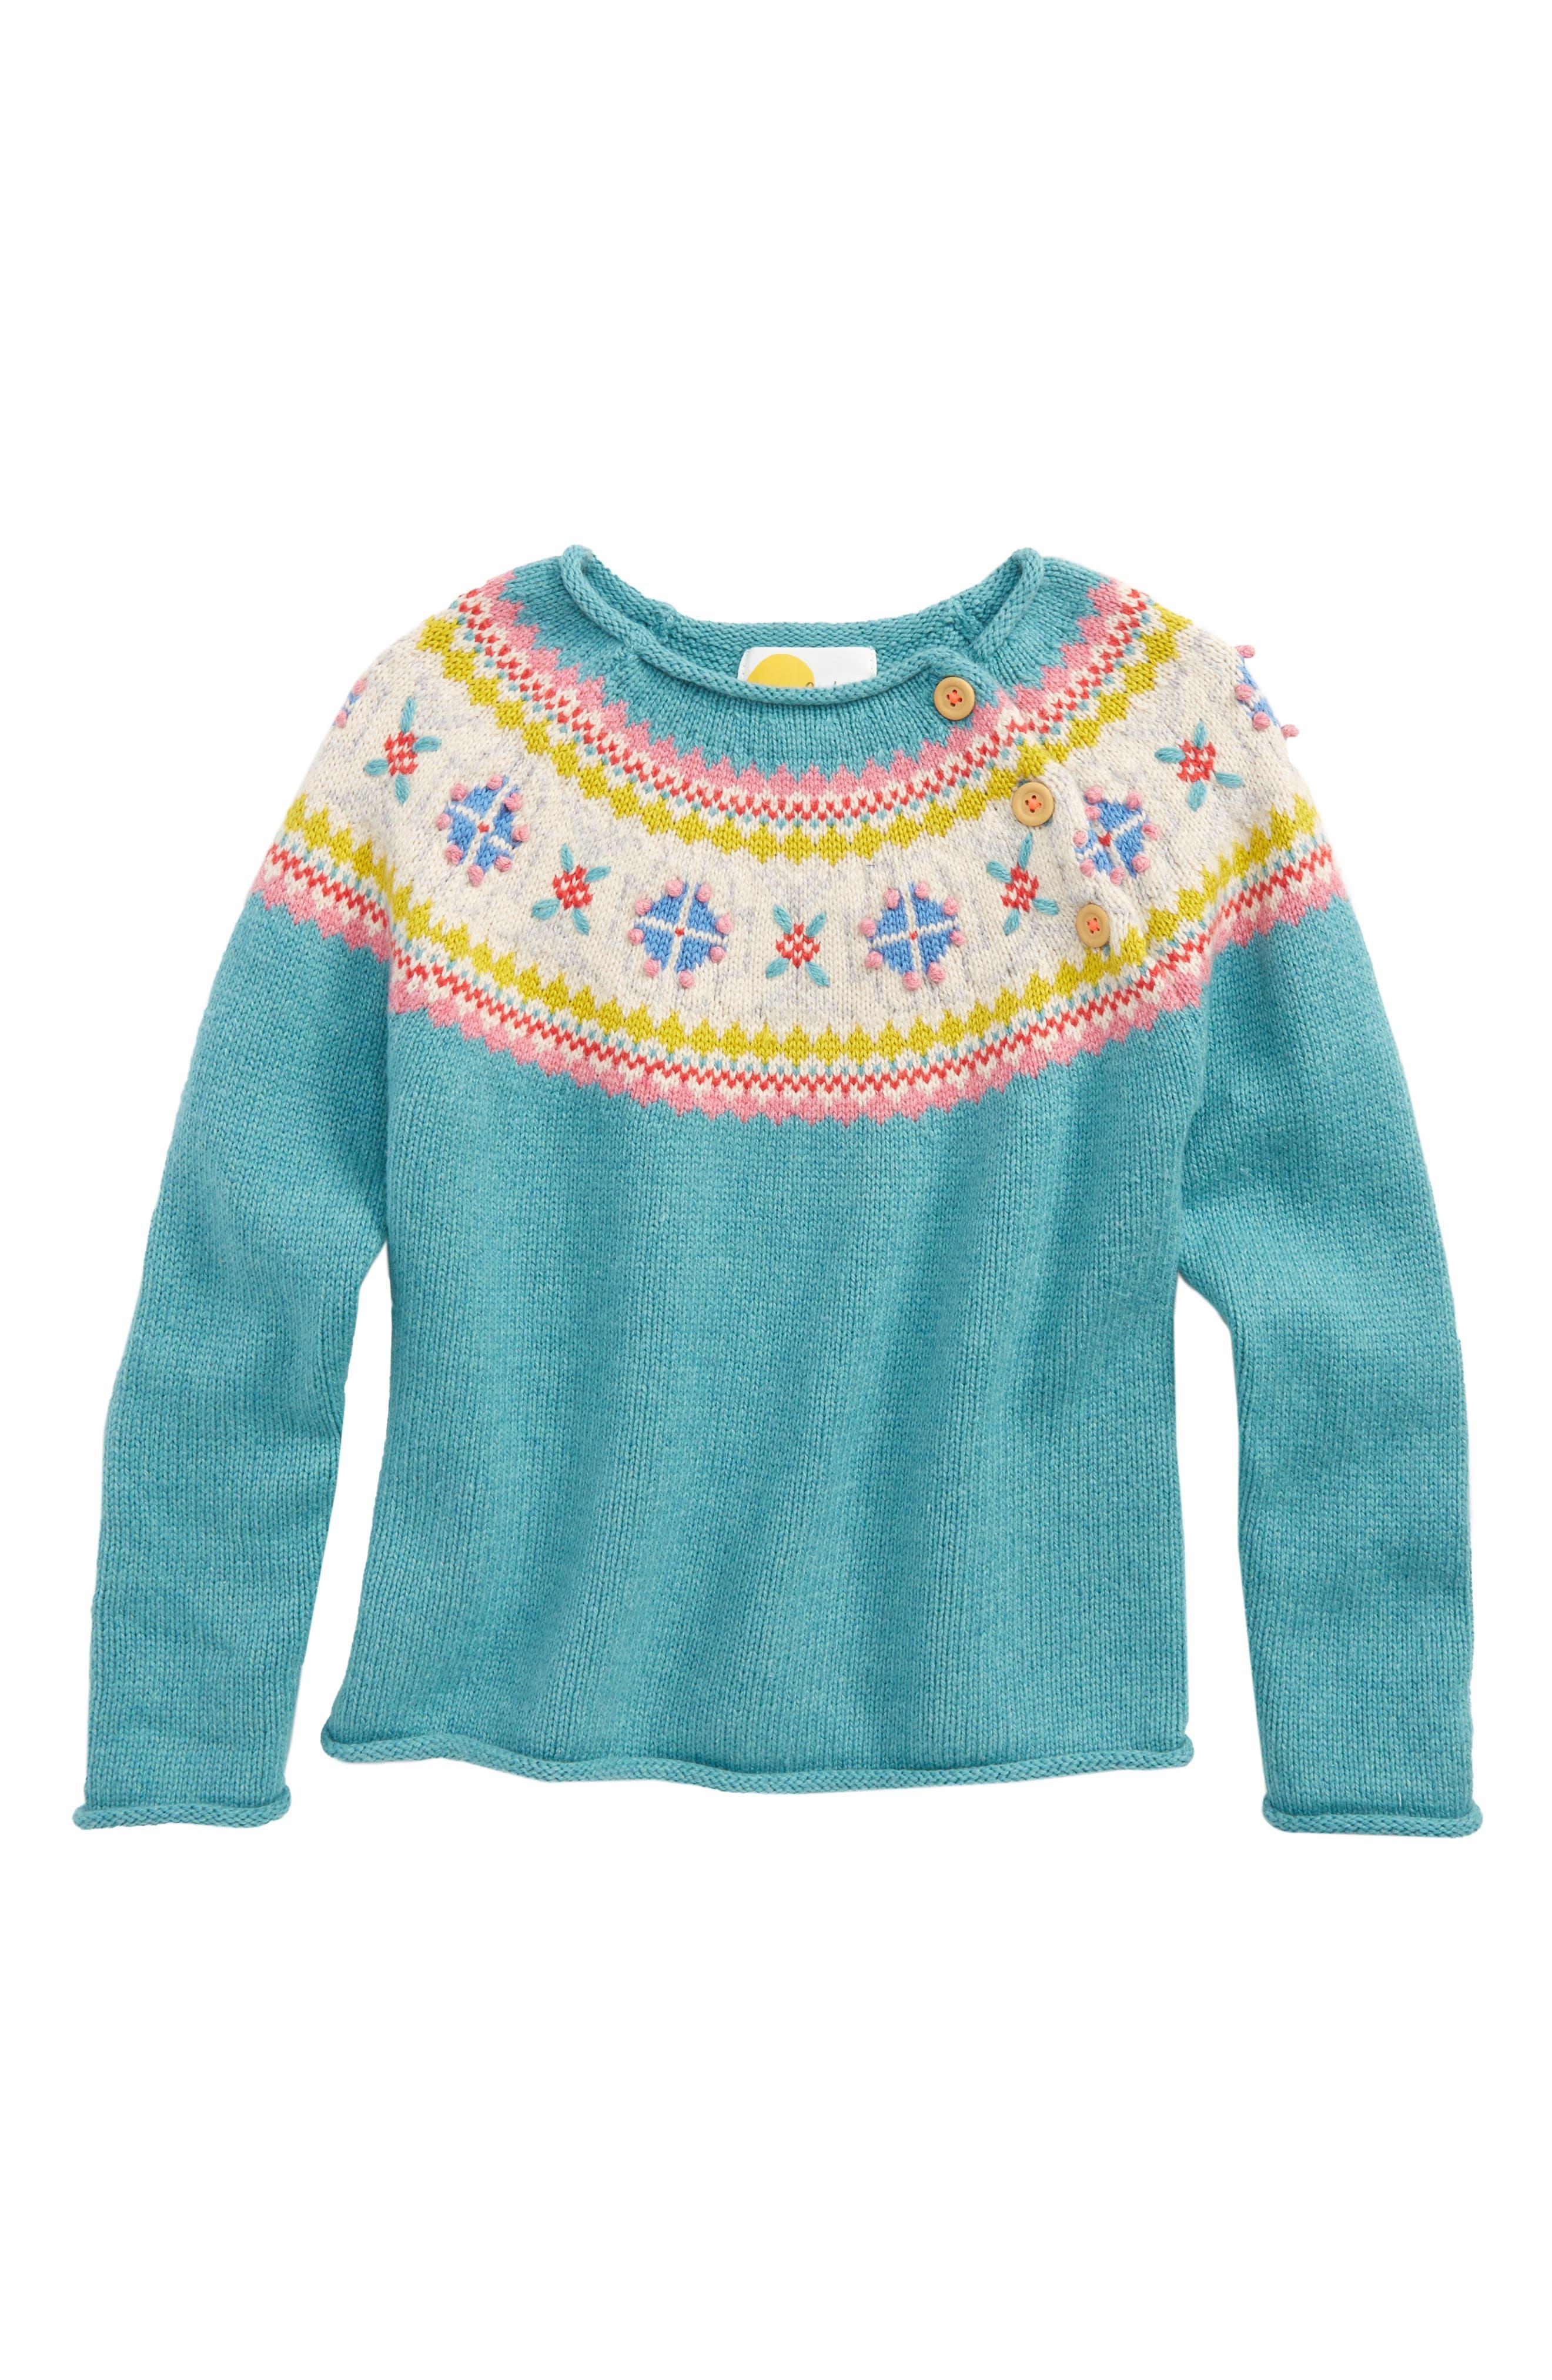 Mini Boden Chunky Knit Jumper Sweater (Toddler Girls, Little Girls & Big Girls)